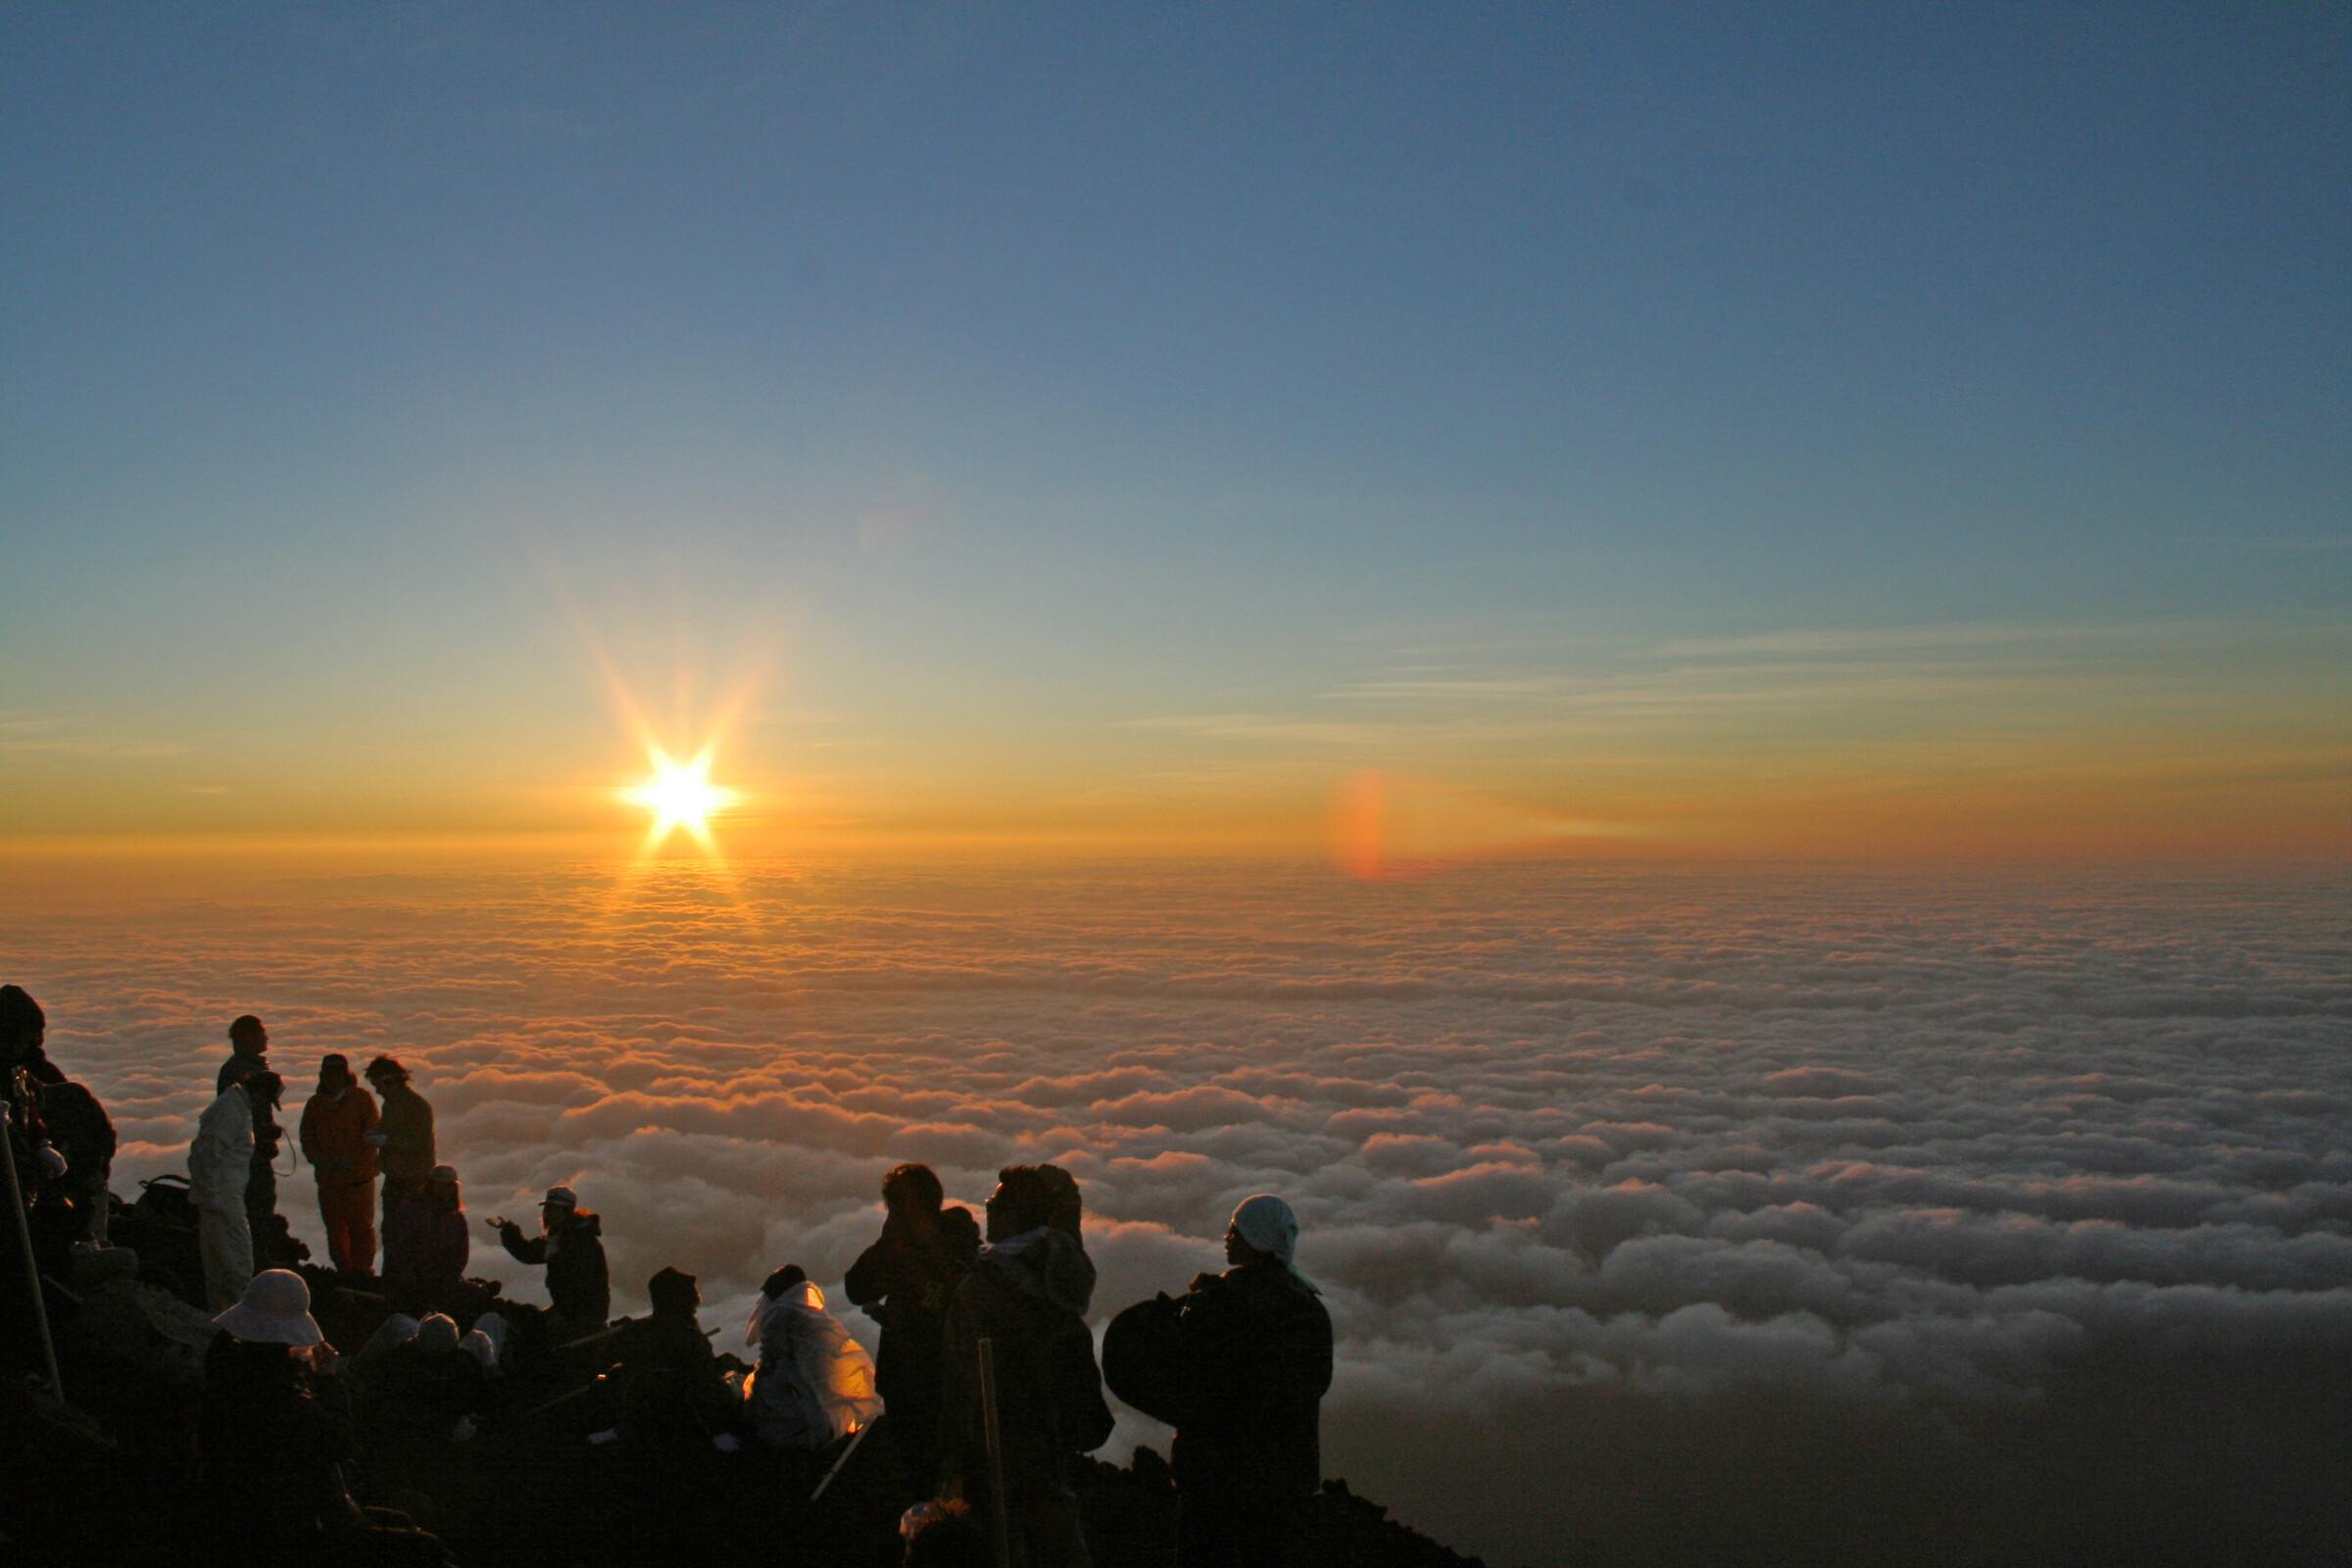 Sunrise at the top of Mount Fuji